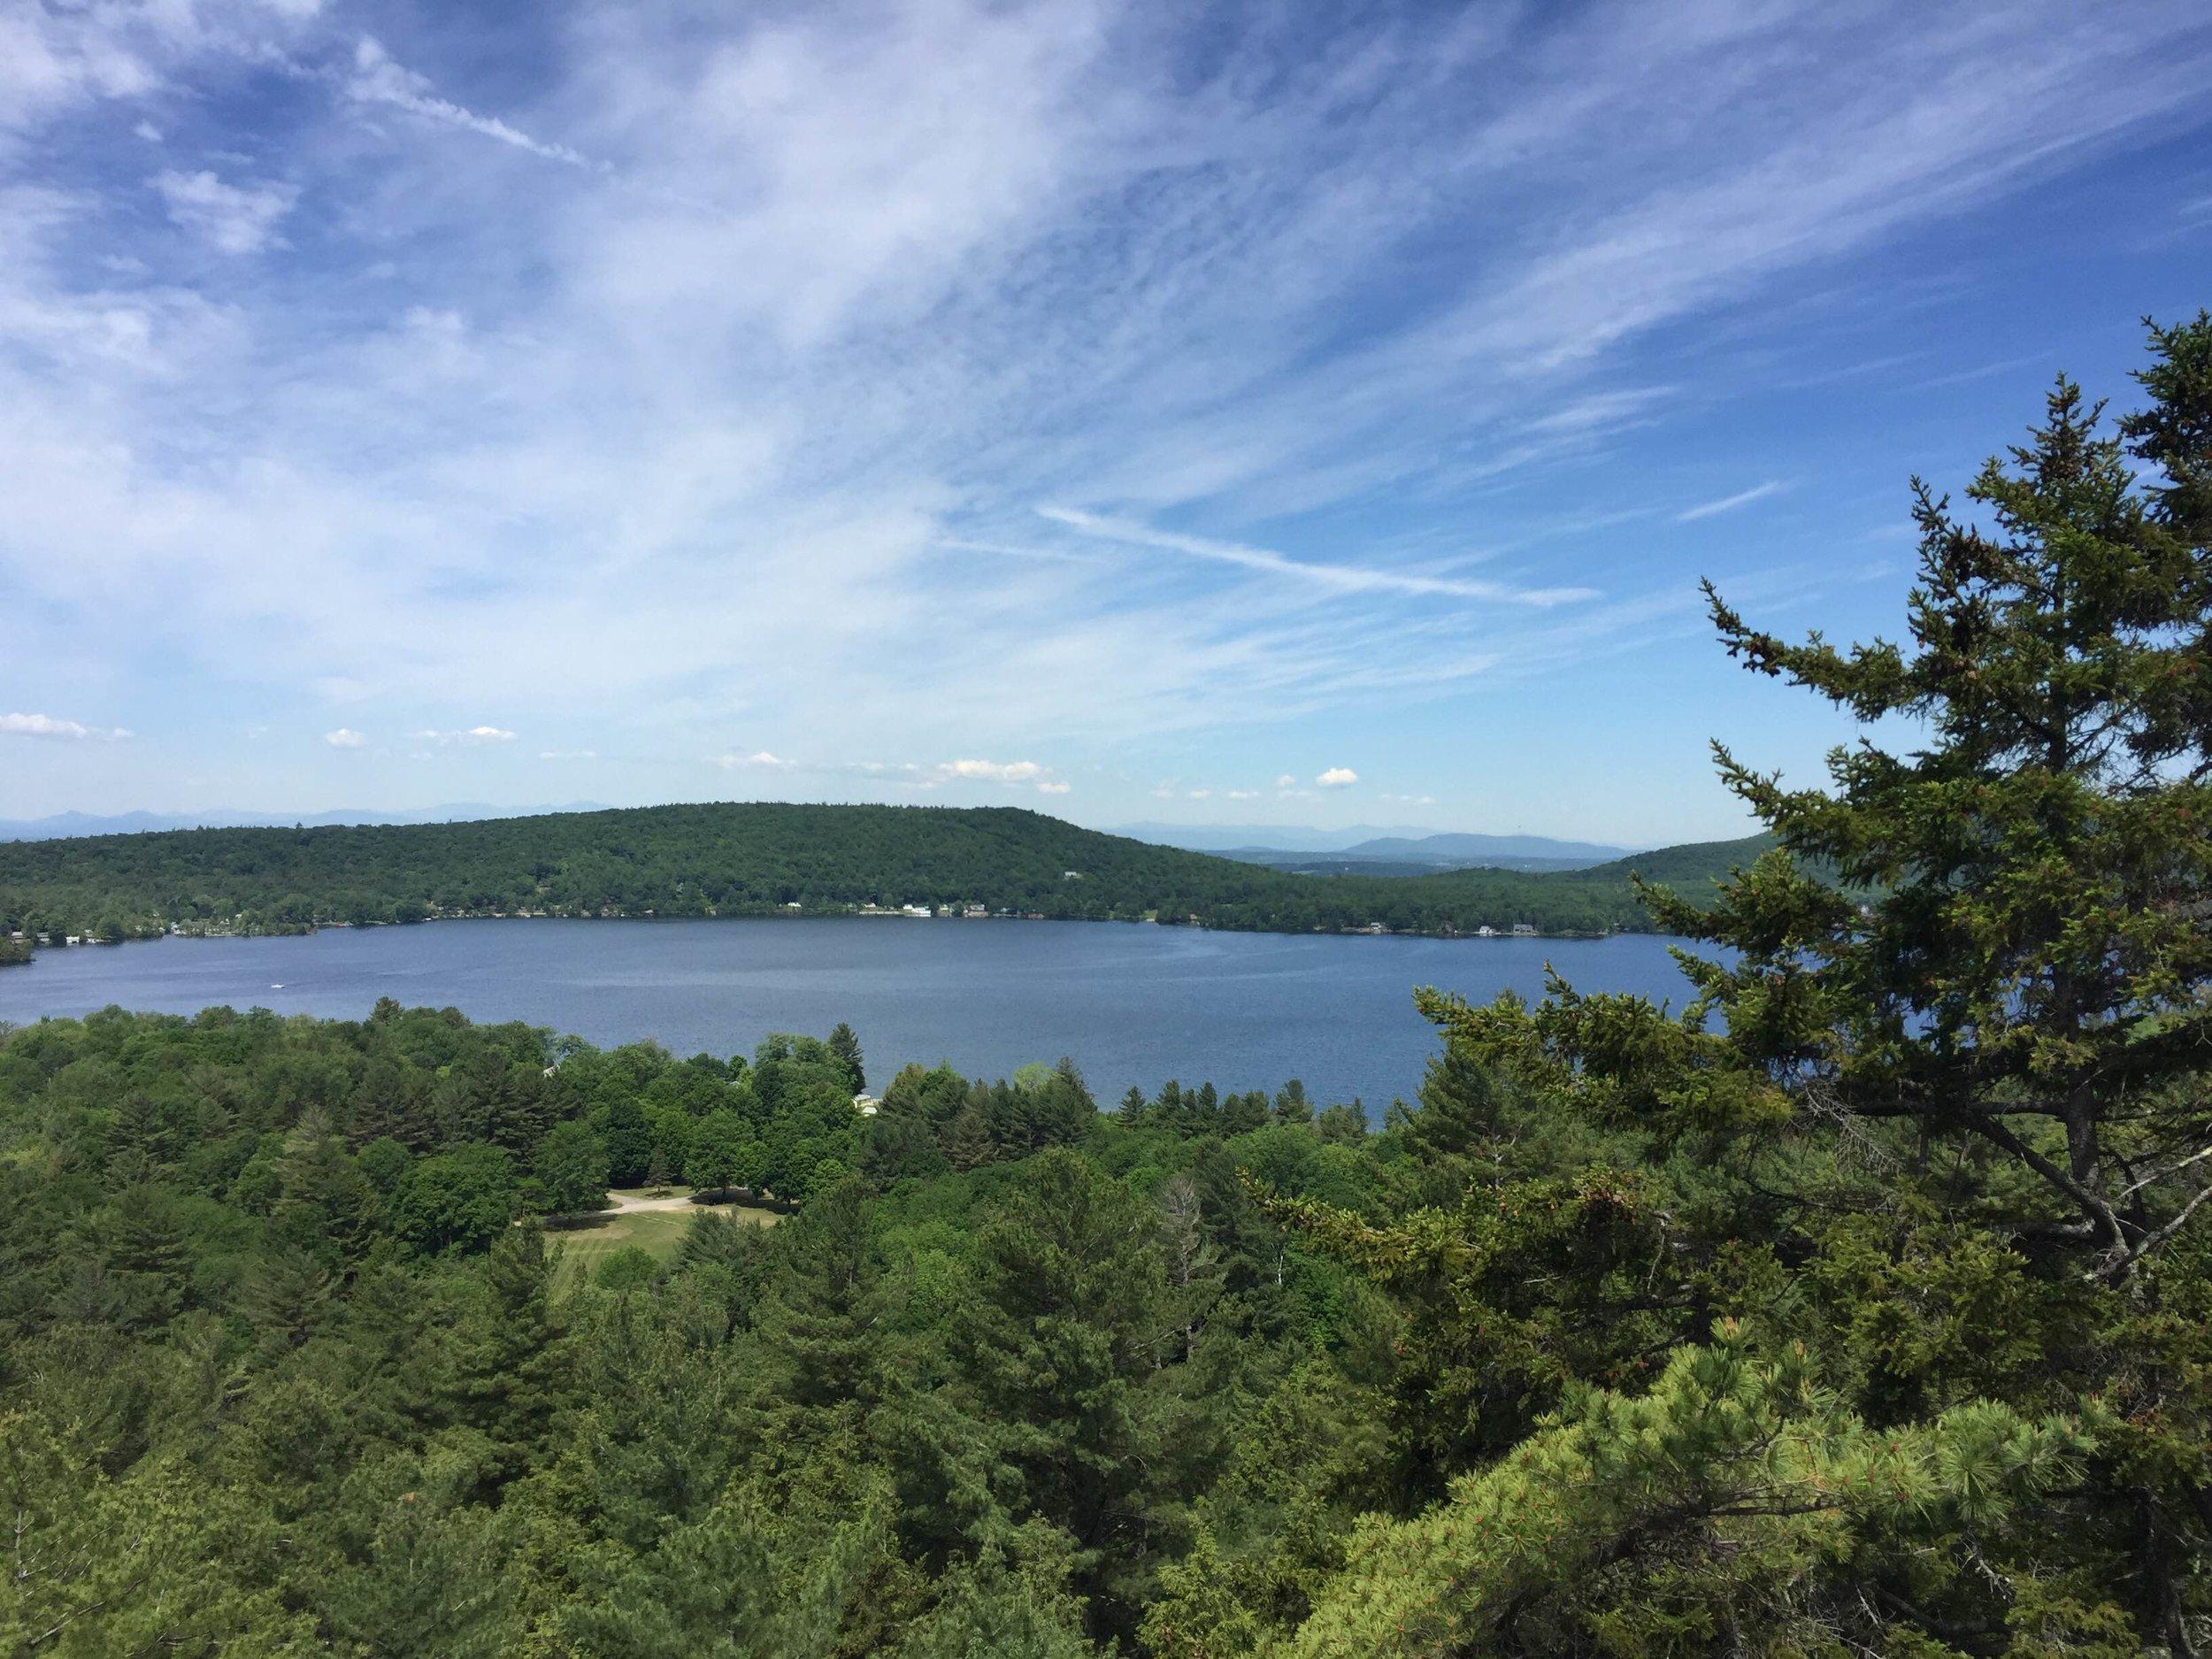 View of Lake Dunmore